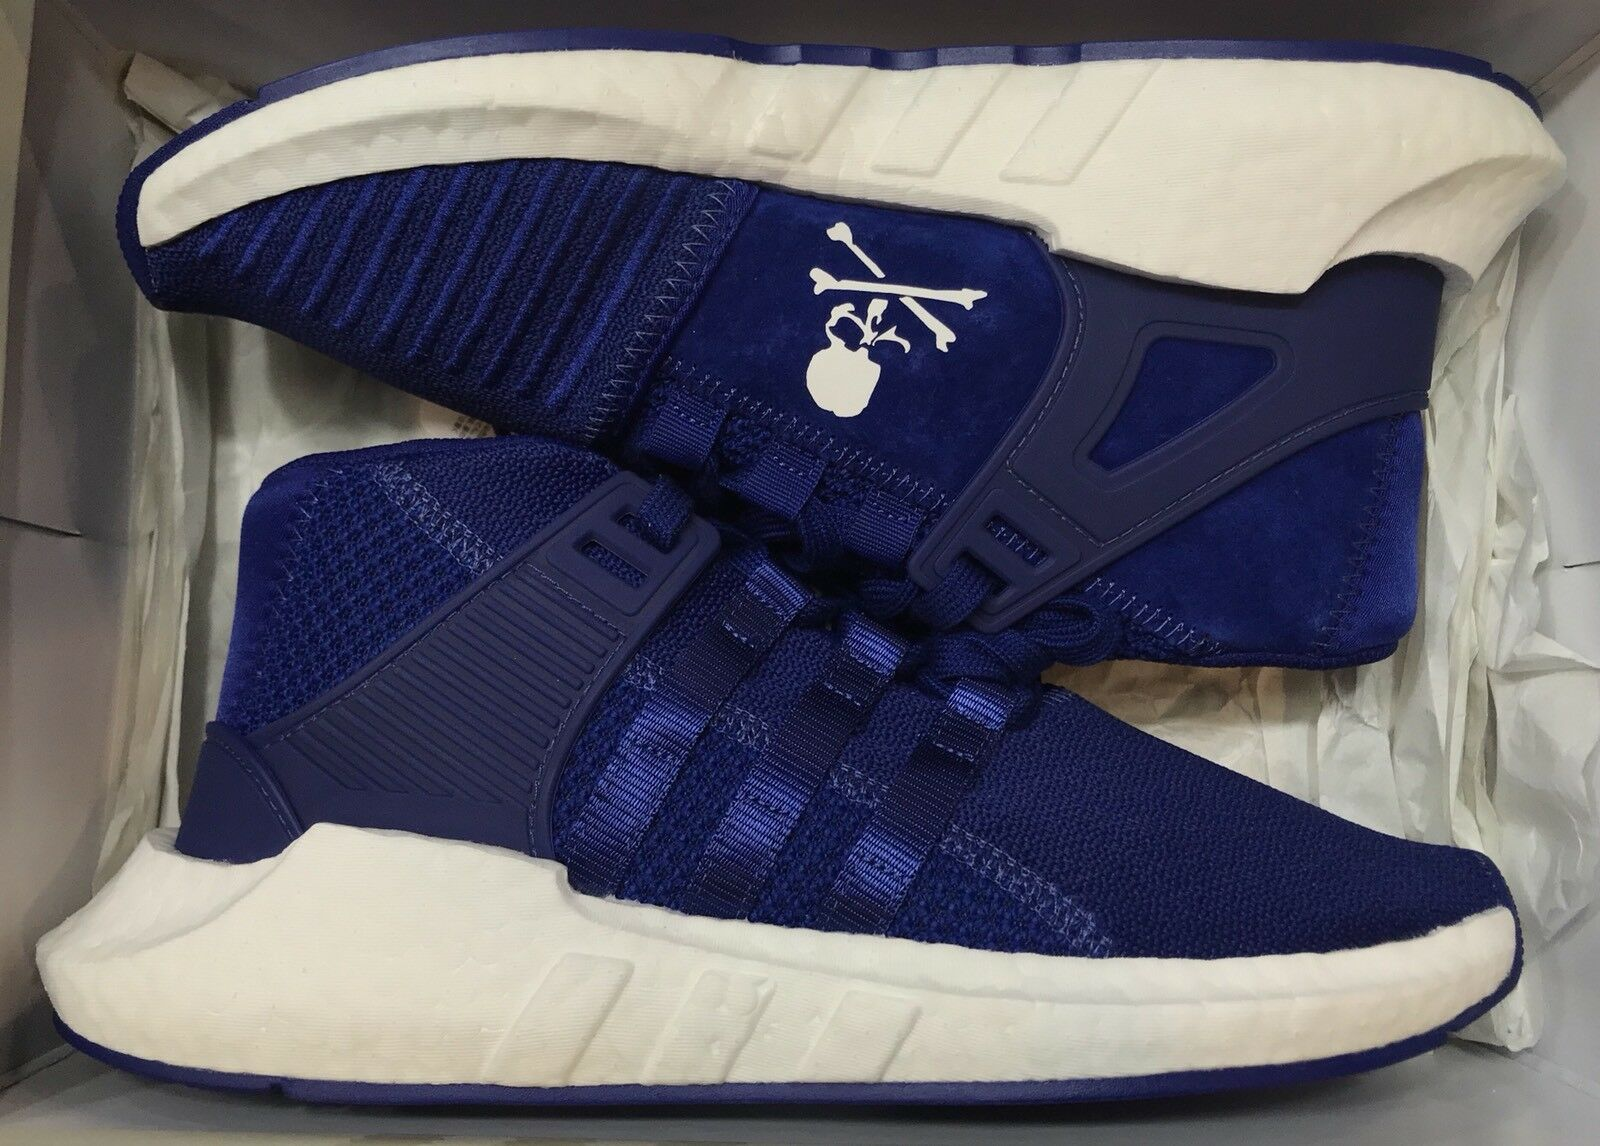 Adidas EQT Support Mid MMW Mastermind Mystery Ink Blue CQ1825 Sz 8.5